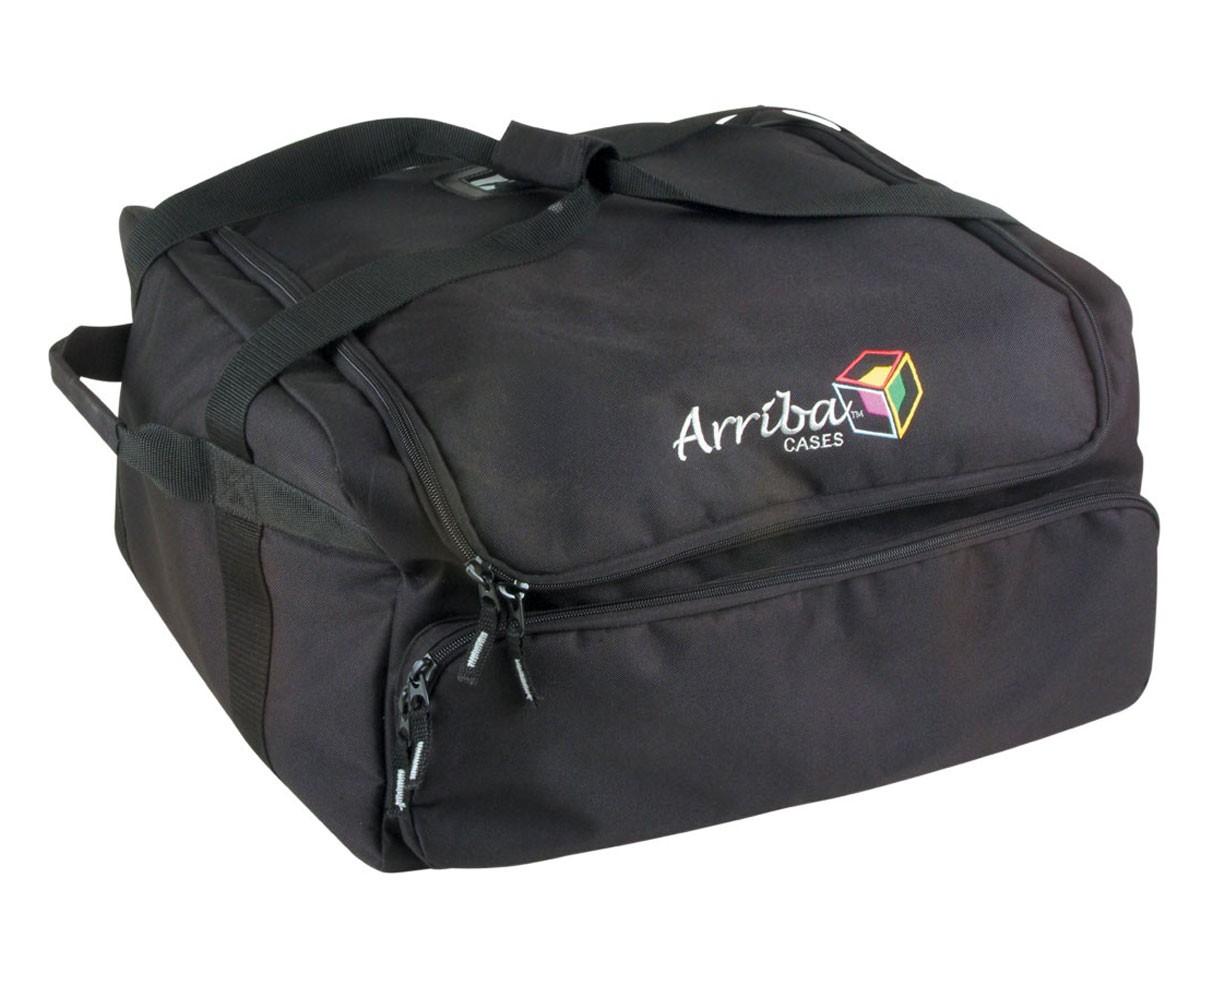 Arriba Cases AC-145